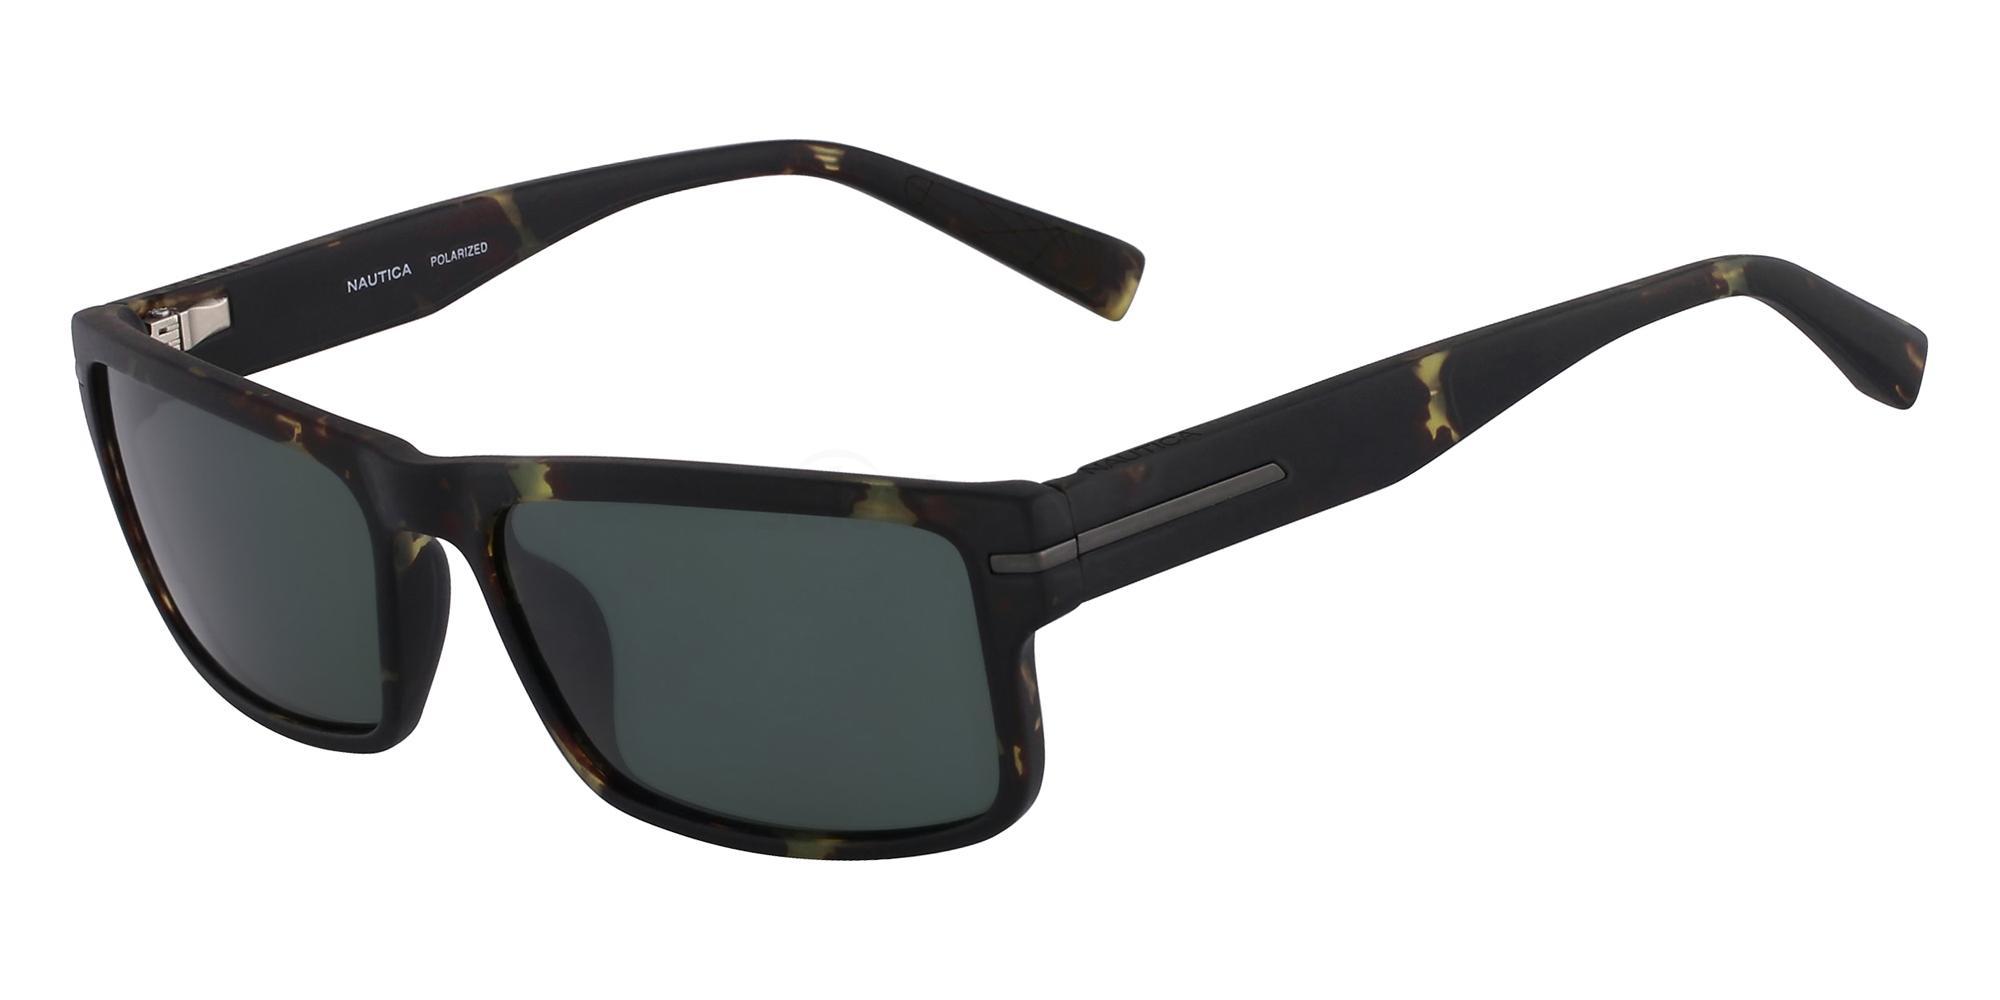 325 N6186S Sunglasses, Nautica